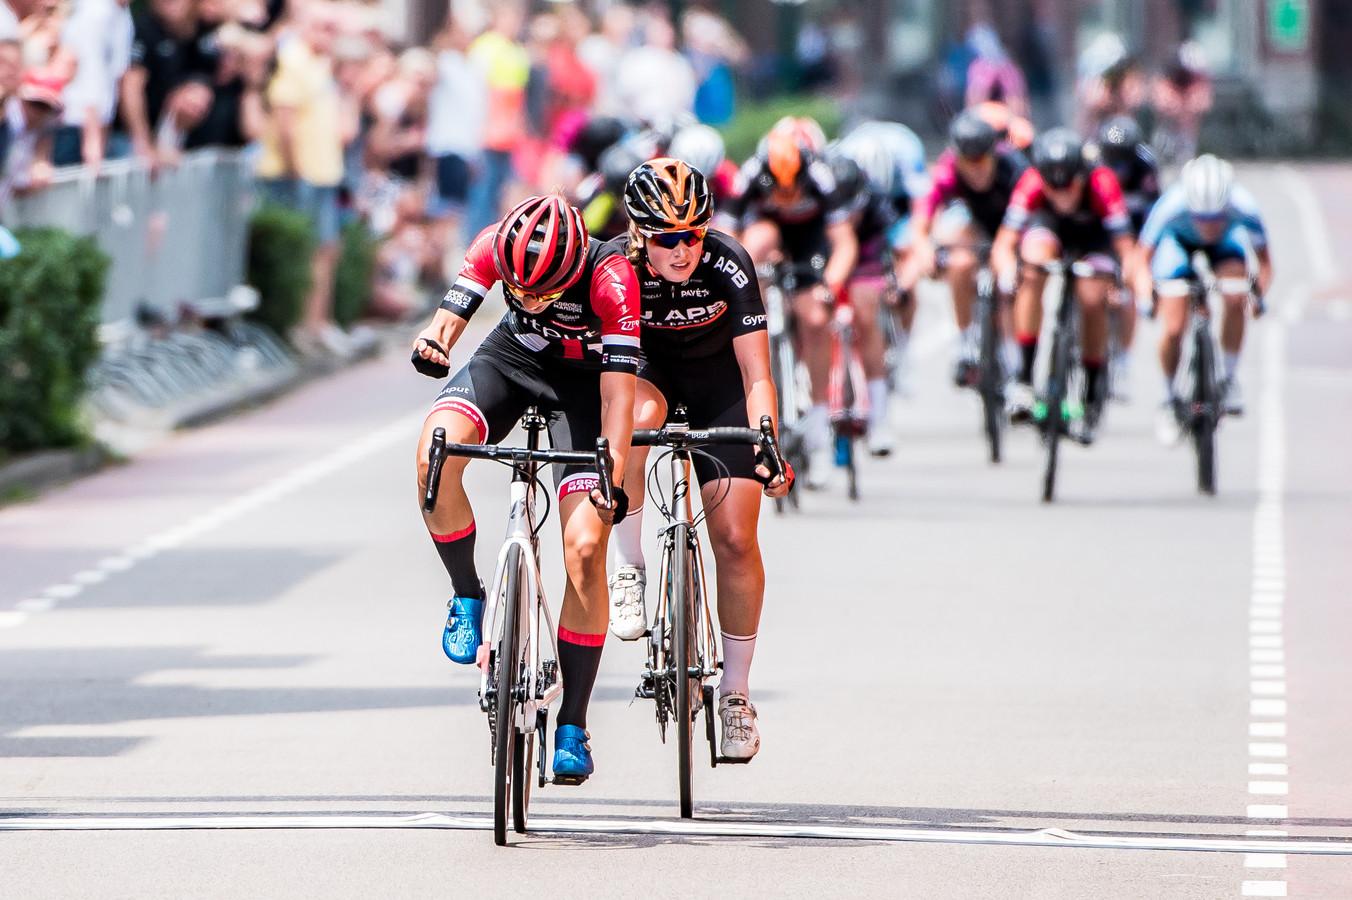 Femke Gerritse klopt Ilse Pluimers in de lange sprint om de juniorentitel.